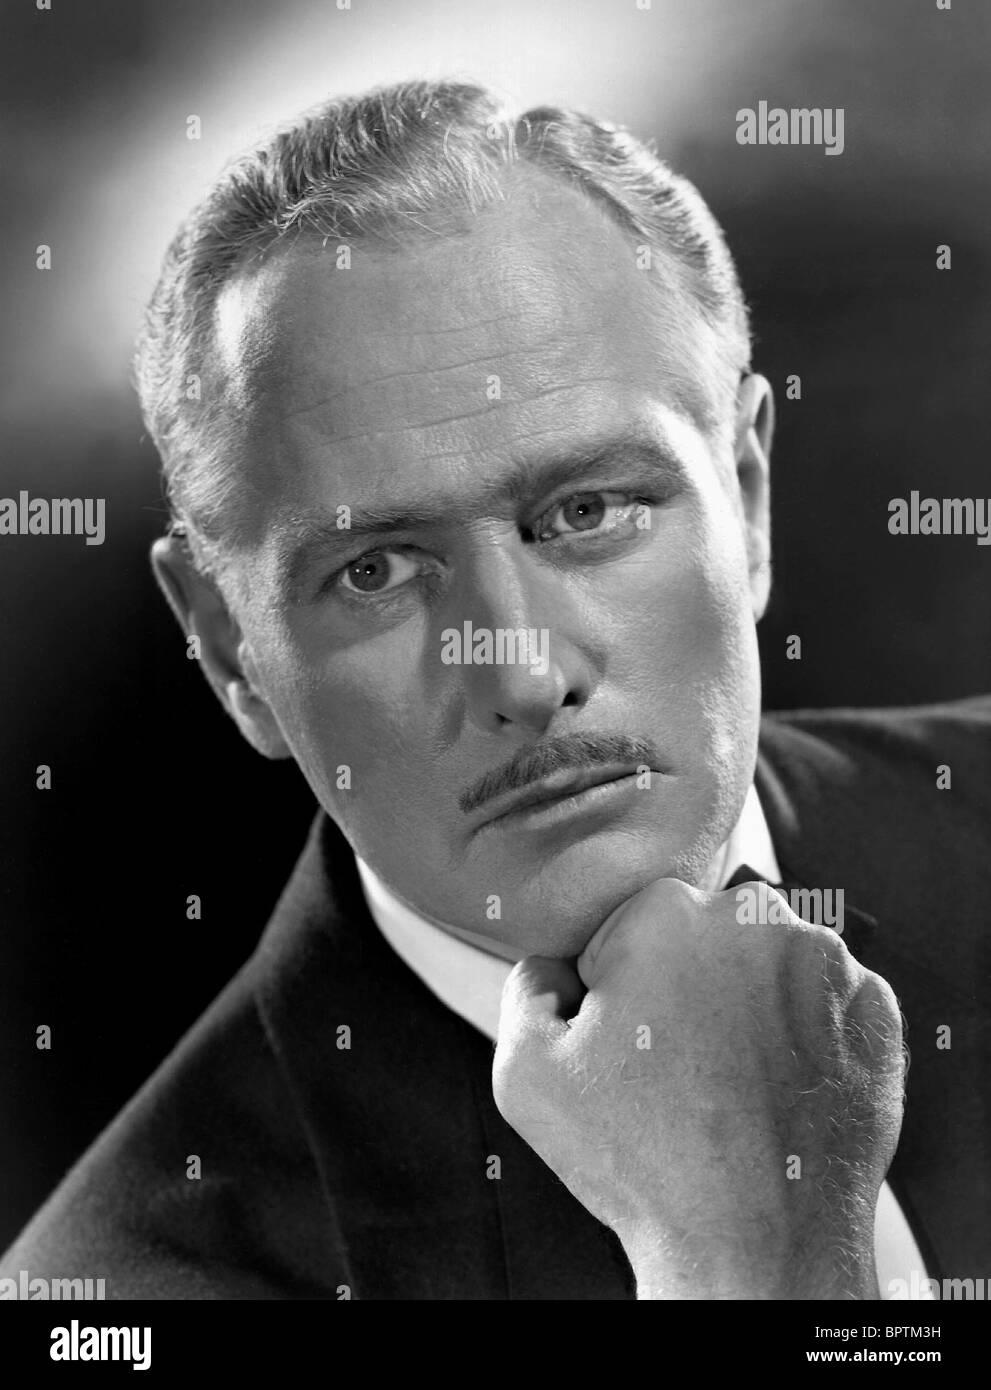 ROLAND CULVER ACTOR (1938) - Stock Image